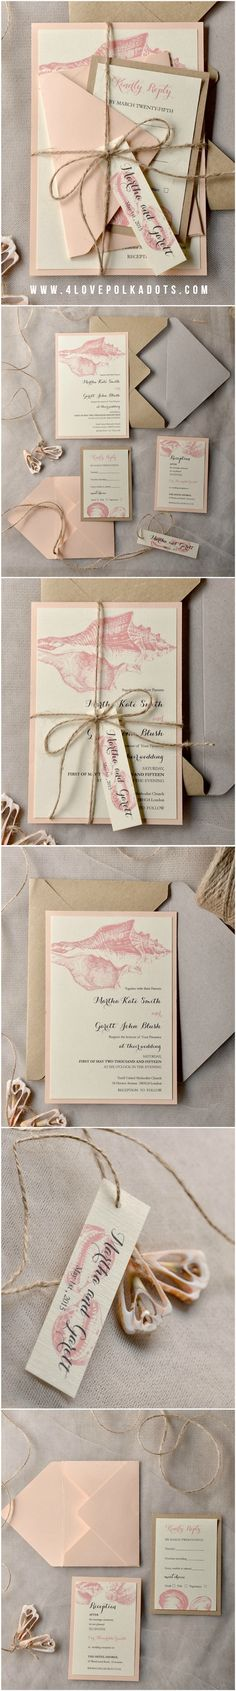 Beach Wedding Invitations with Seashells - peach & eco kraft paper #beach #beachwedding #seashell #rustic #nature #weddingideas